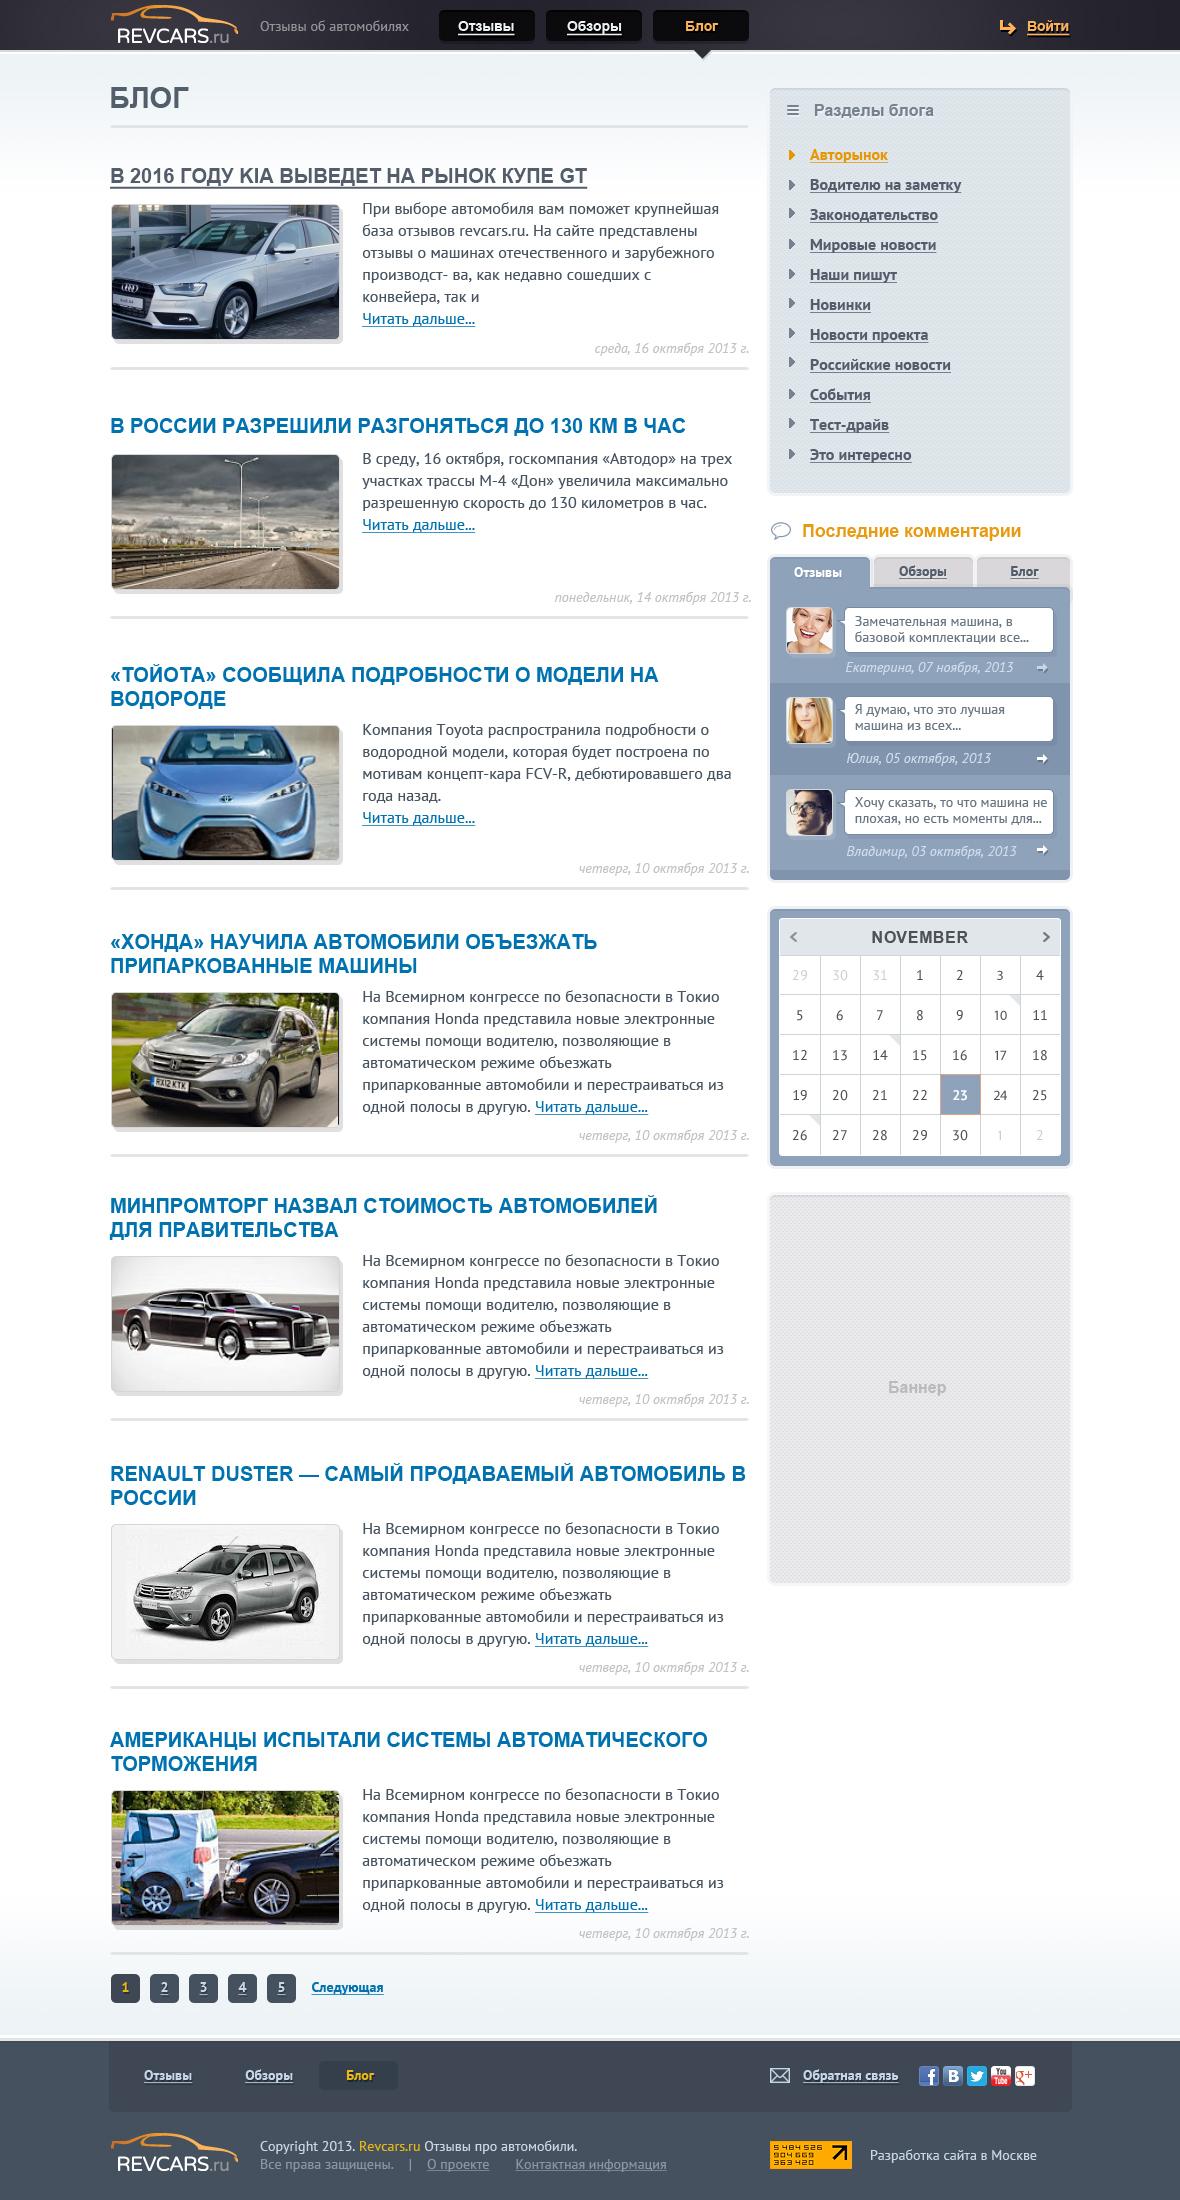 RevCars - сайт об автомобилях